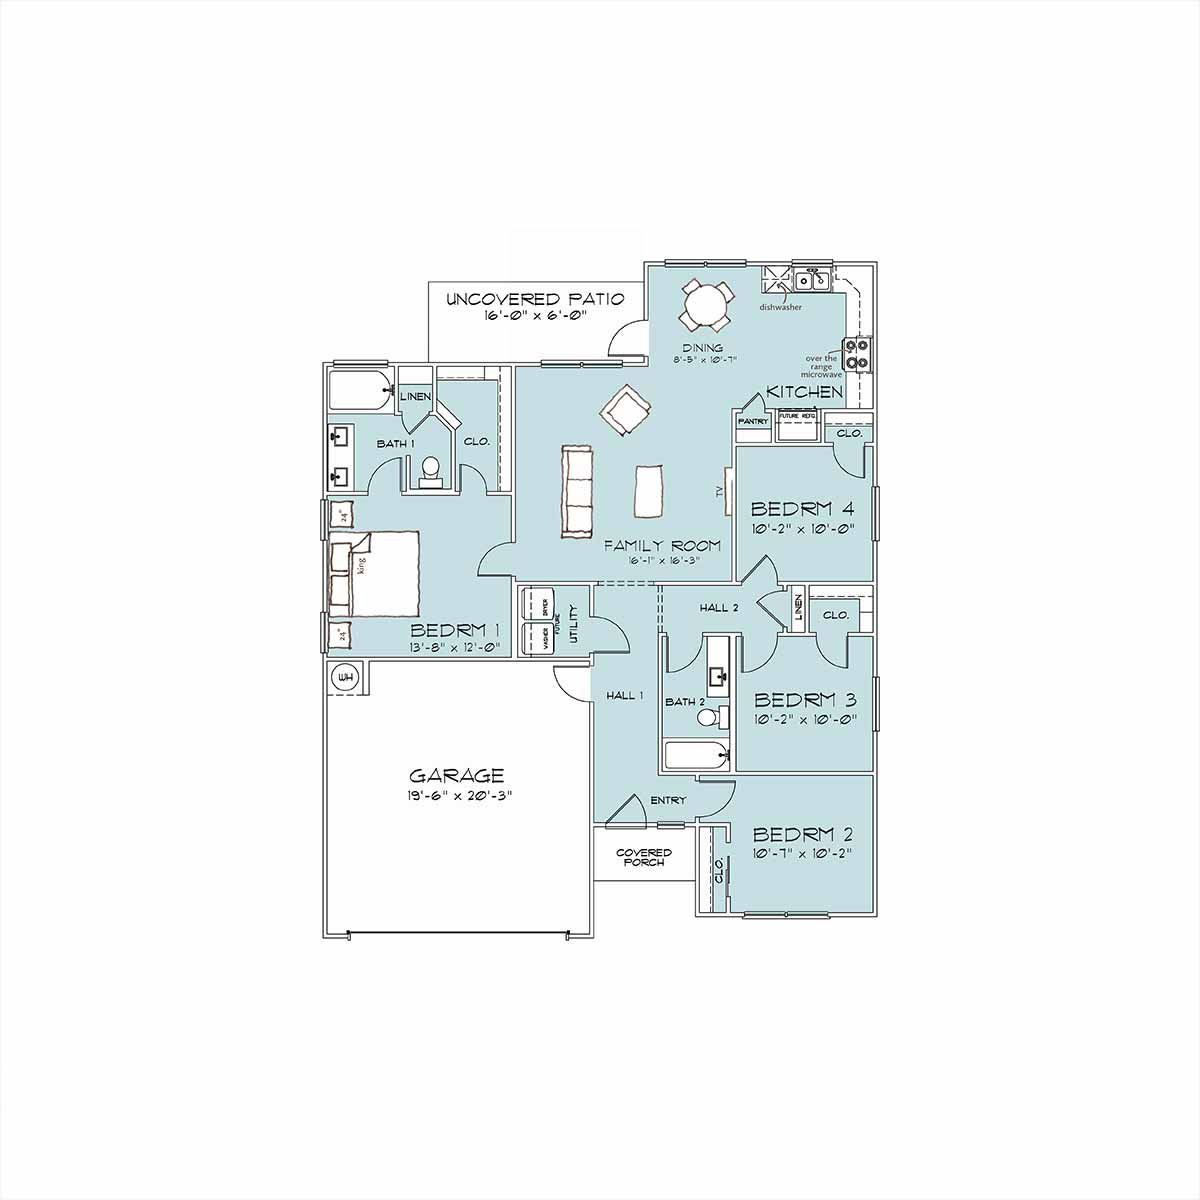 Fenway Floor Plan by Omega Builders in Heritage Place